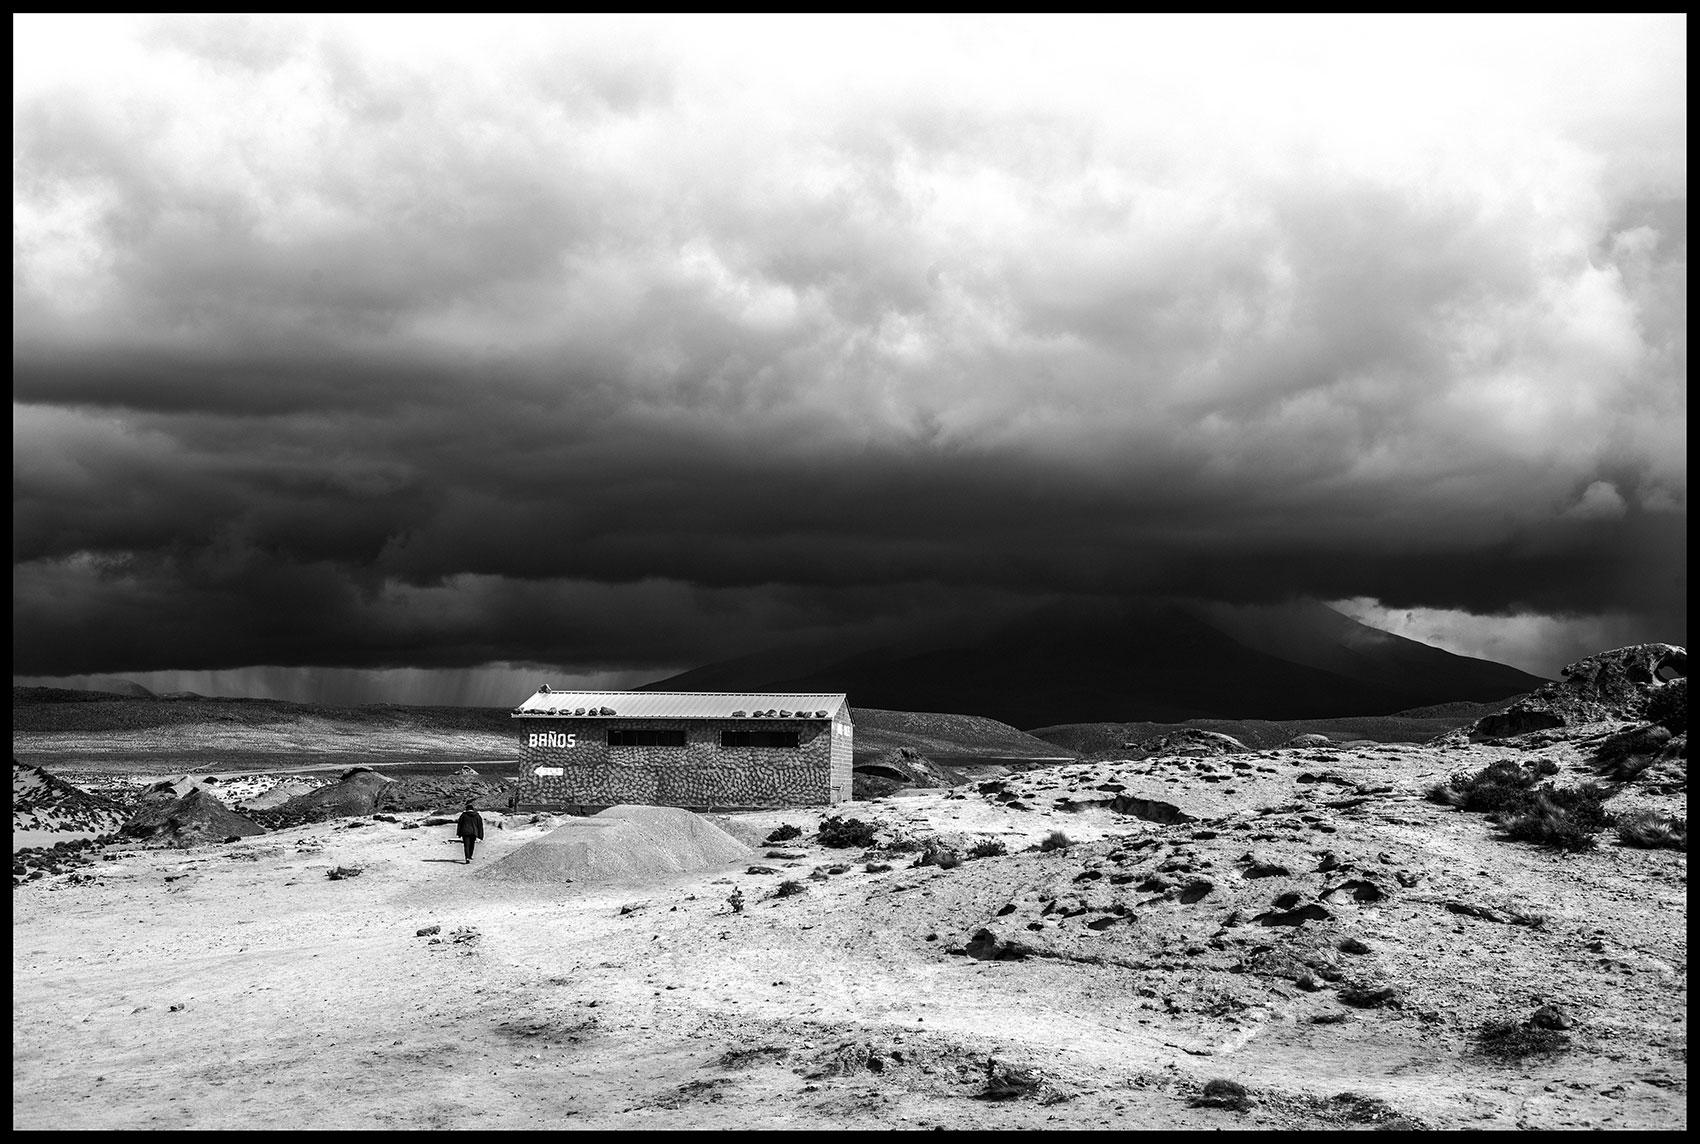 Banos - Before the Storm | Stefano Paradiso - Photographer